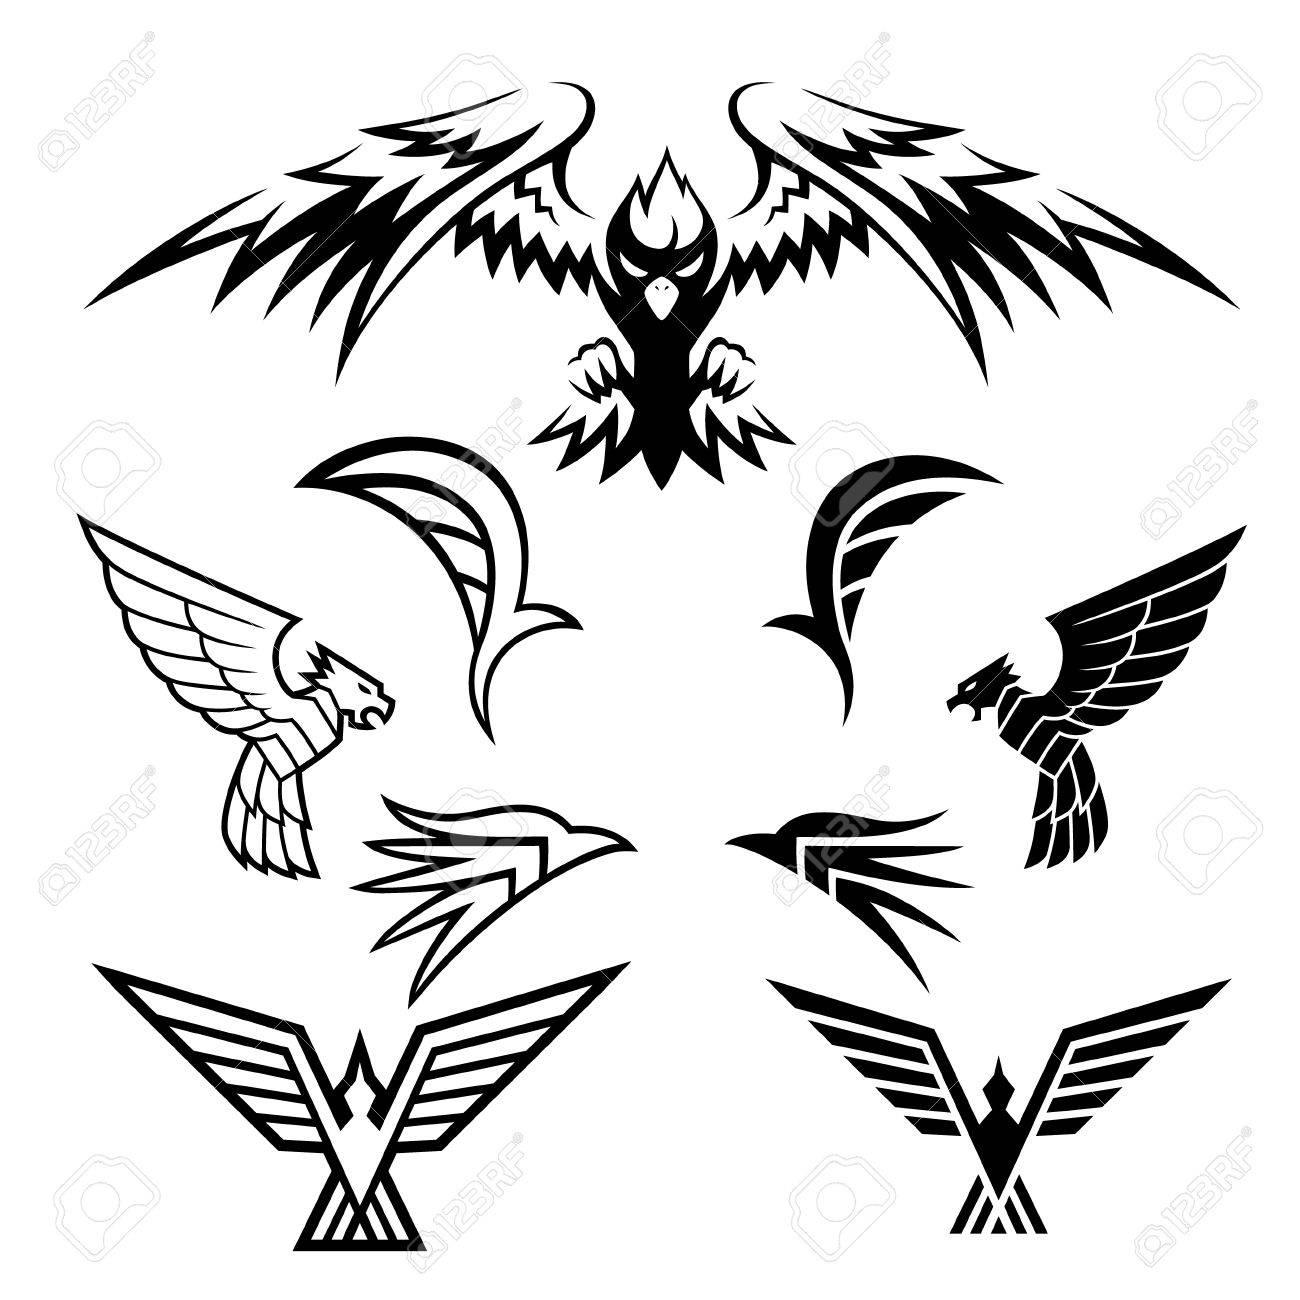 Bird Symbols A pack of bird symbols Stock Vector - 22719388